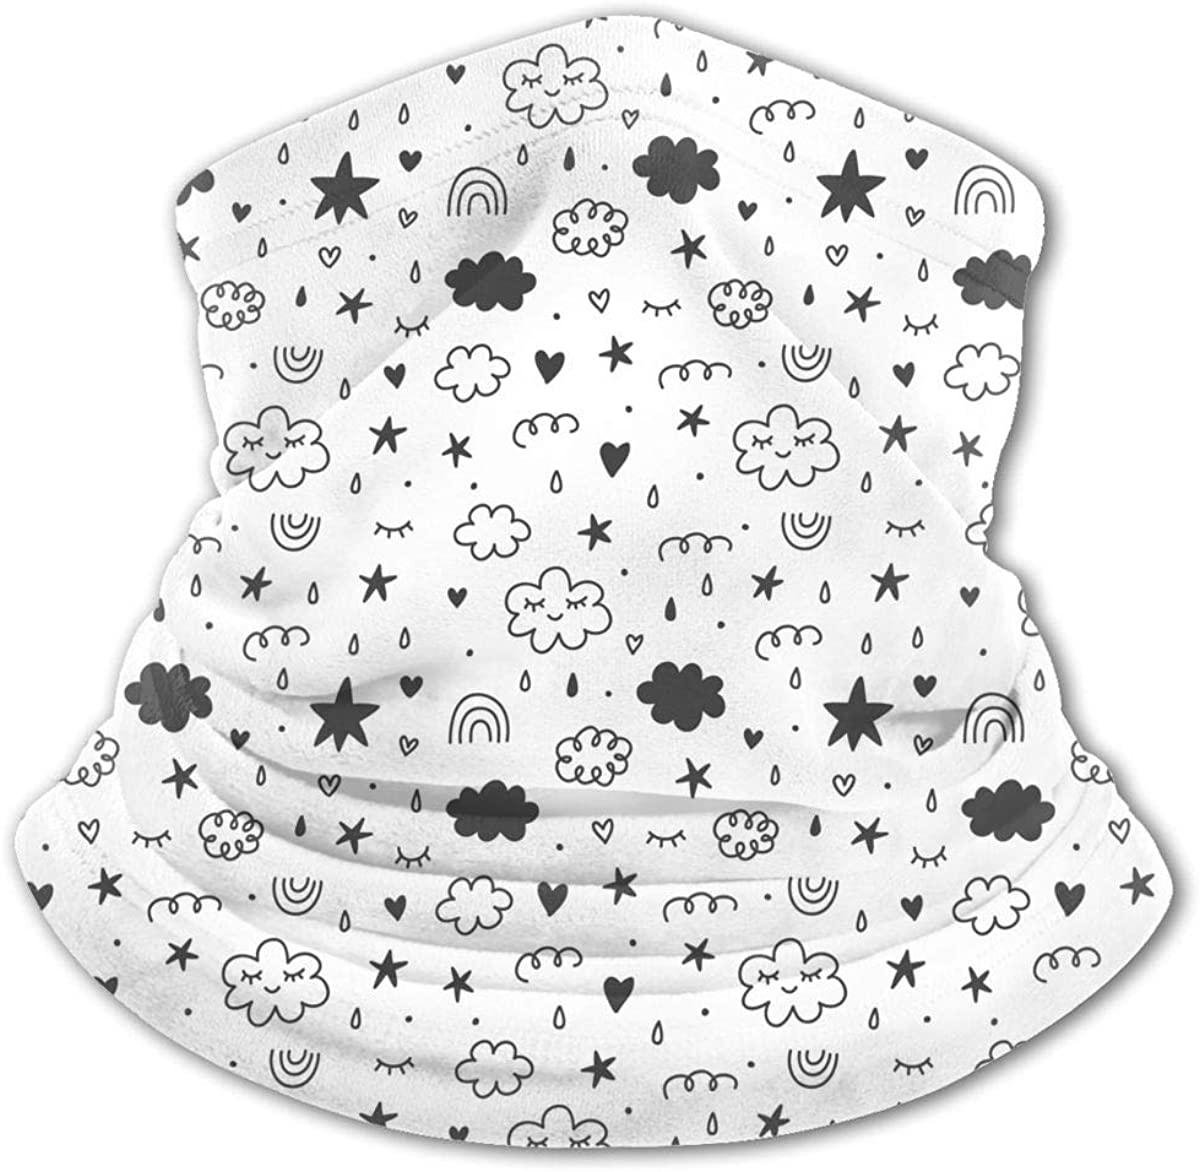 Magic Fairy Tale Kids Neck Gaiter Balaclava Bandana Headwear Cooling Scarf Variety Face Towel